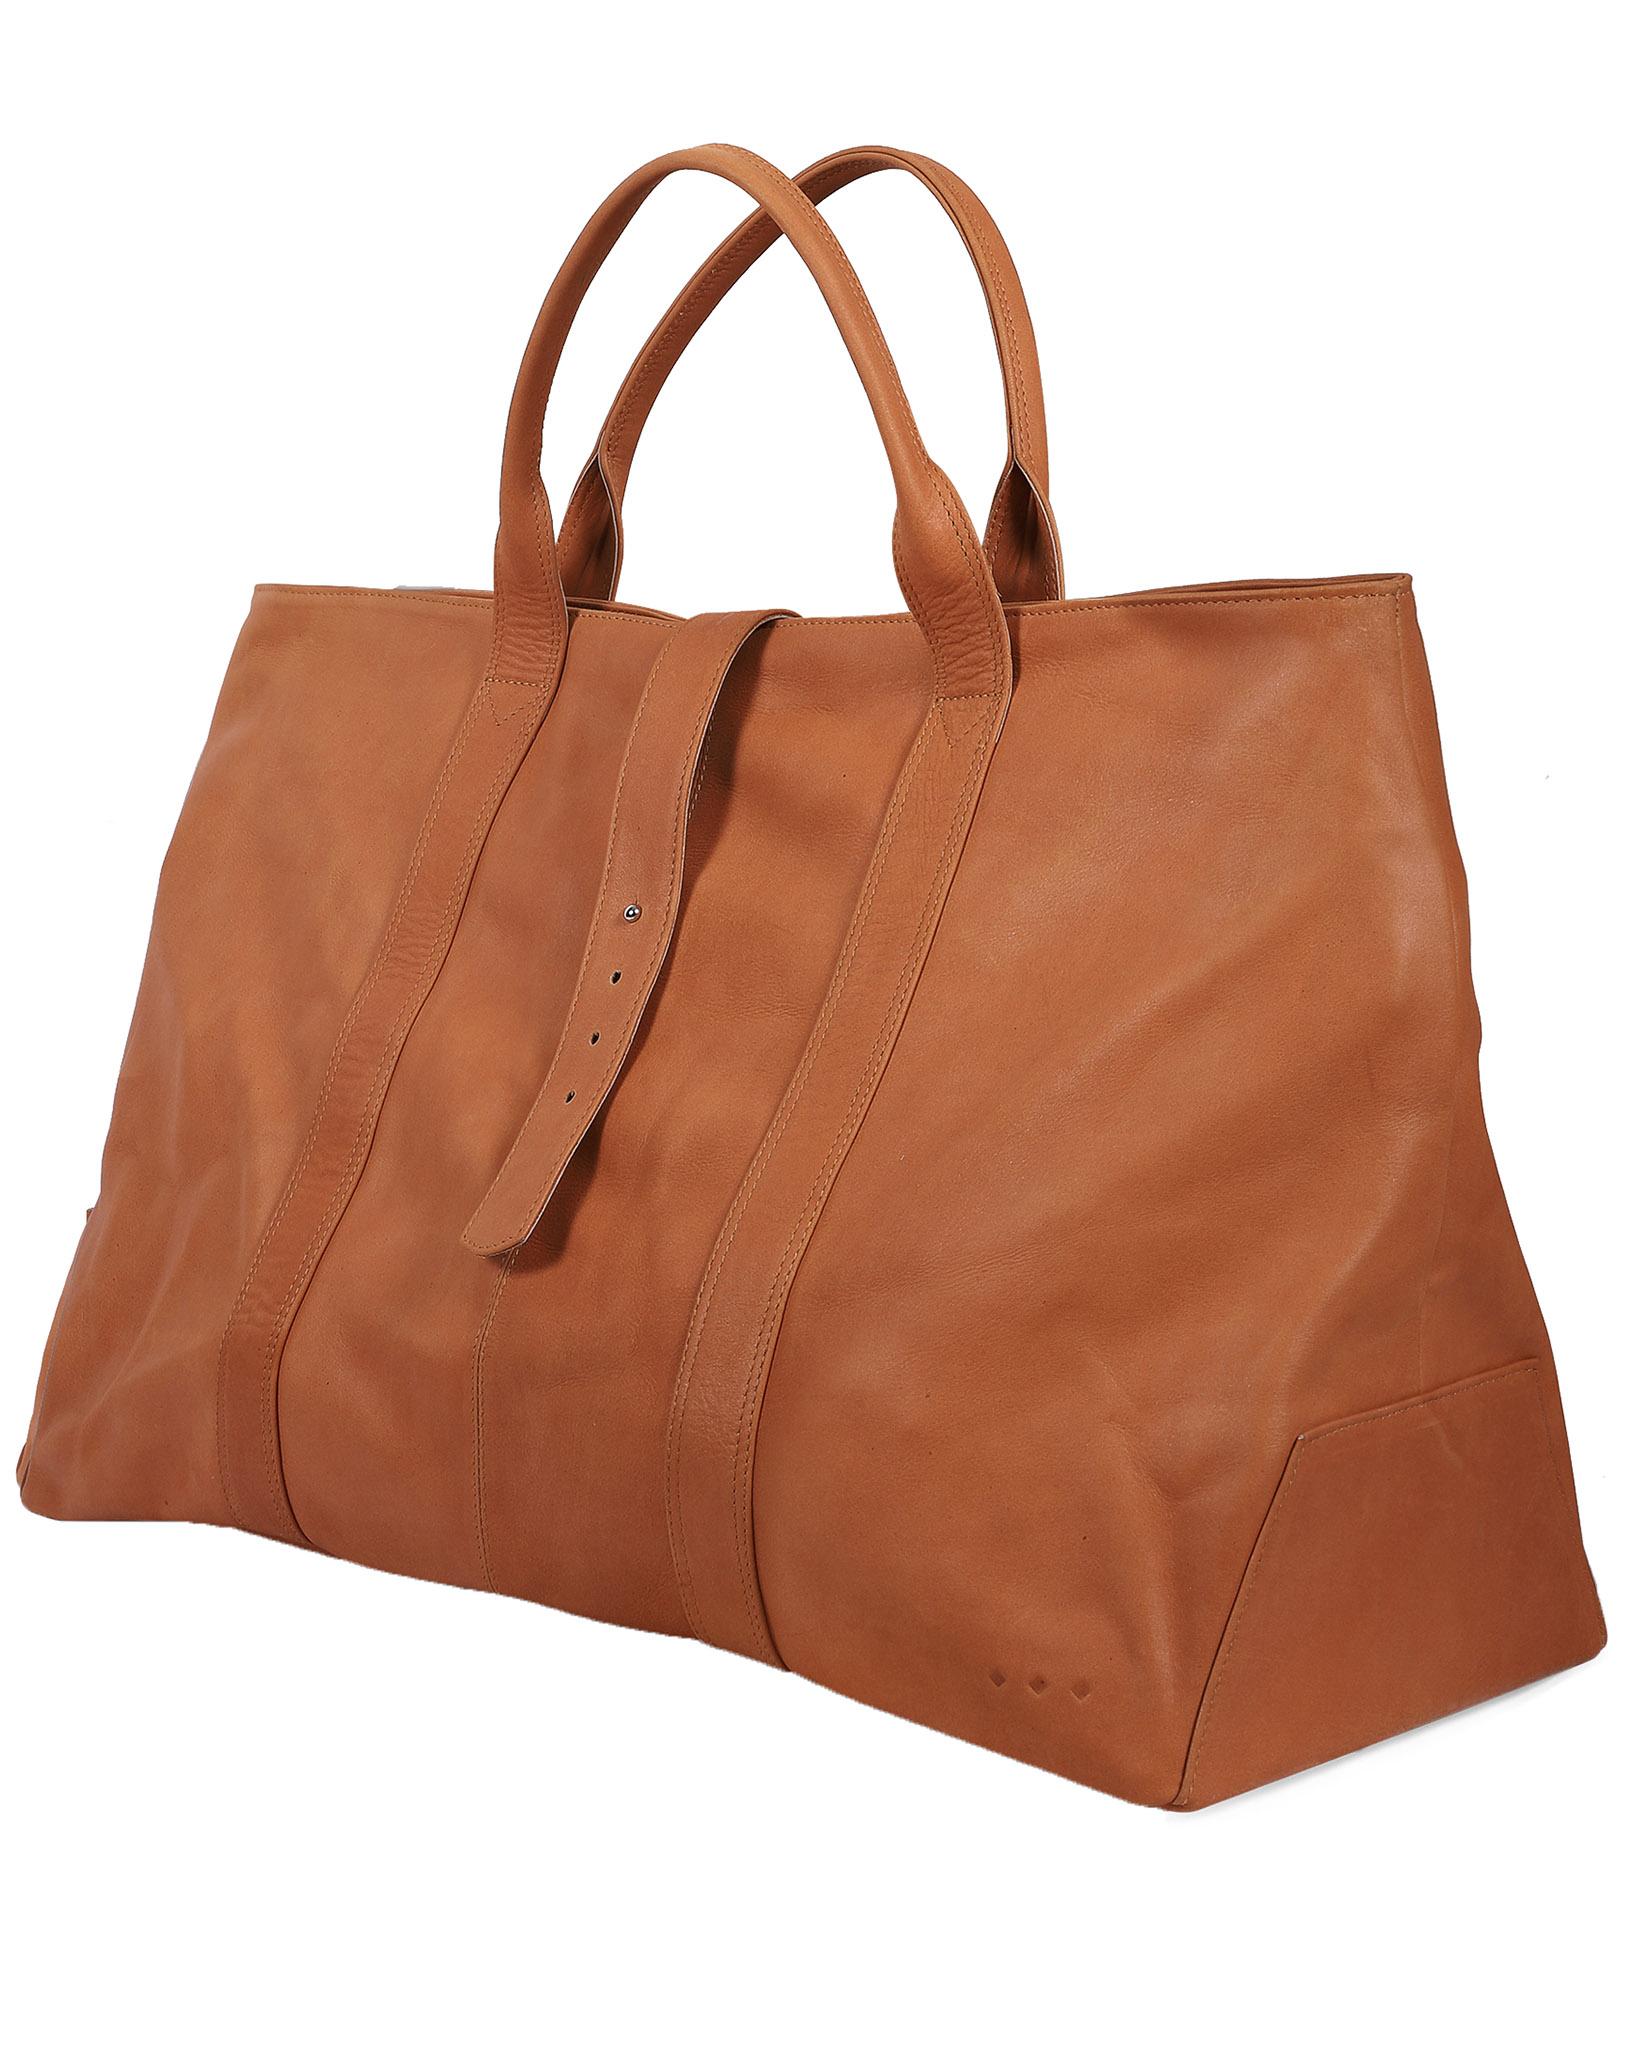 CHATWIN WEEKENER BAG